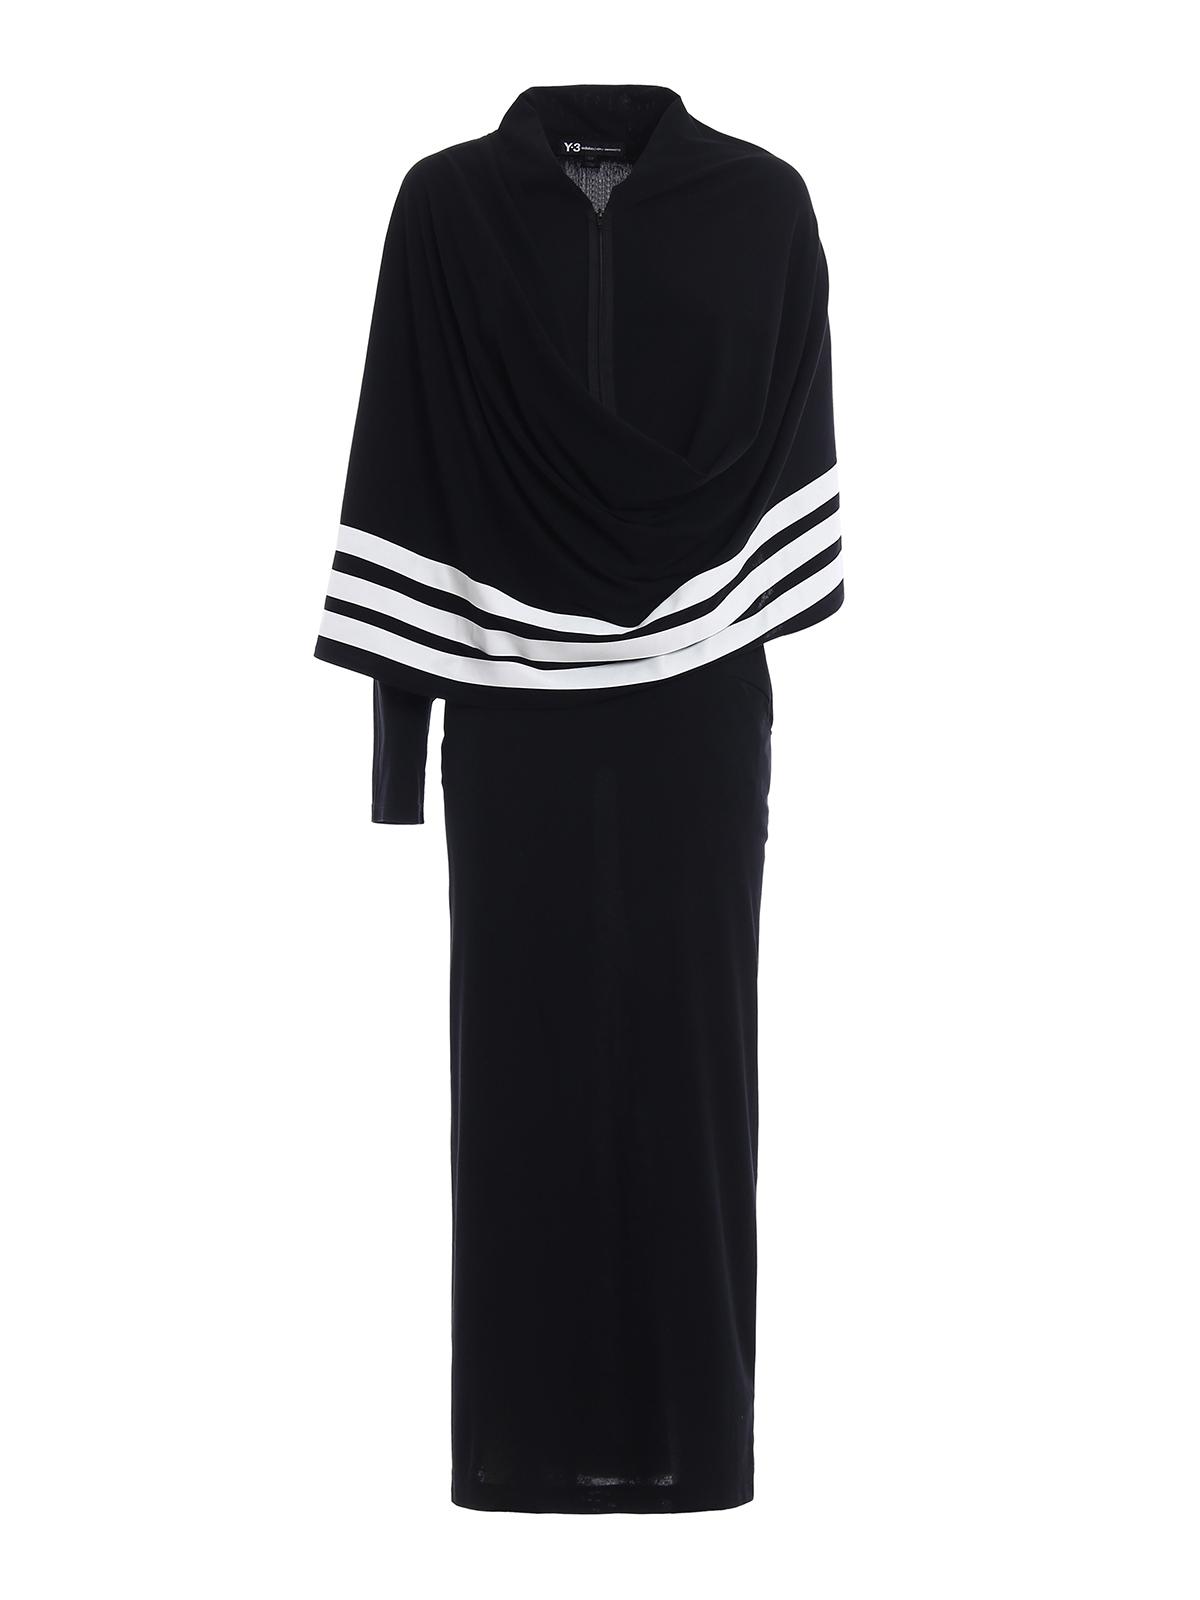 Adidas Y-3 - Vestido Largo - Kimono - Vestidos largos - CY8388 BLACK ... bfa3395f51b